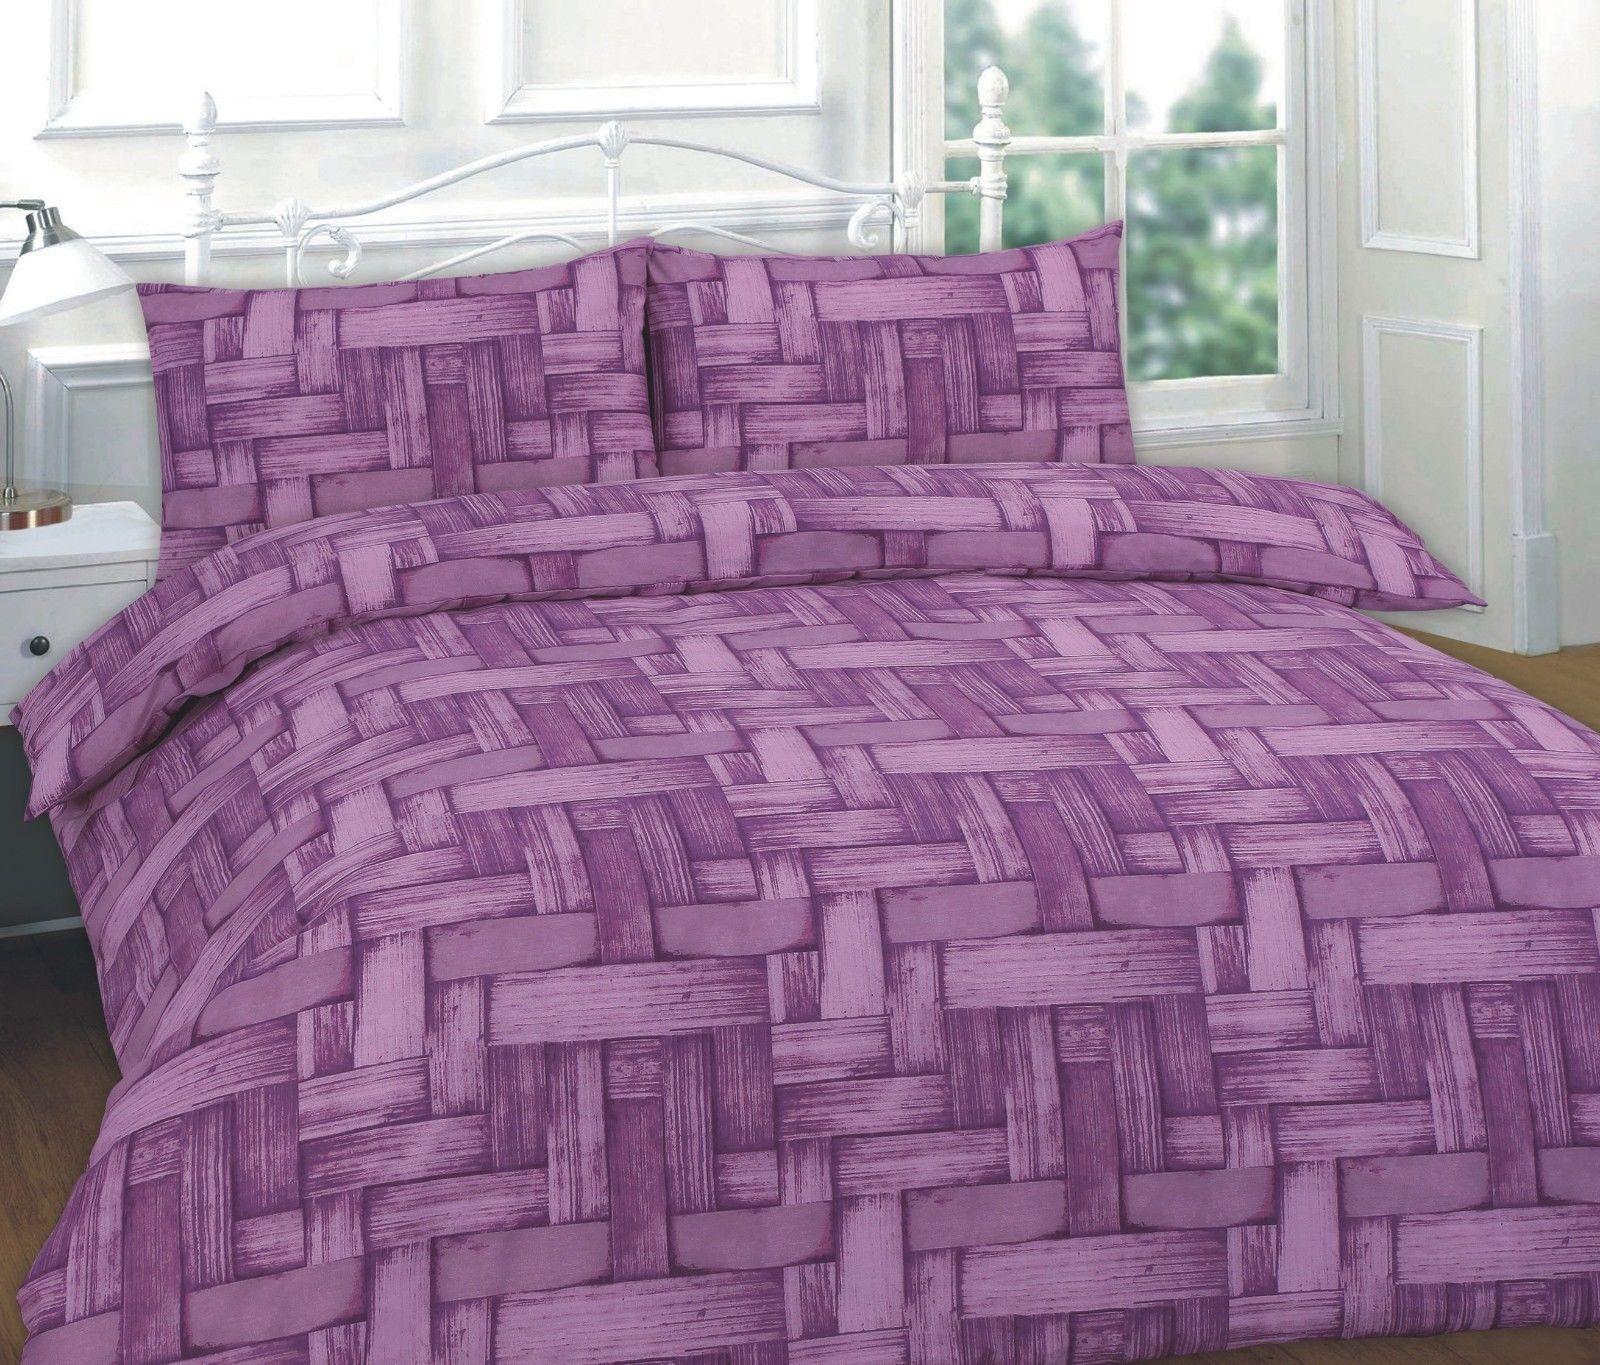 jayce duvet cover set wholesale bedding store de lavish. Black Bedroom Furniture Sets. Home Design Ideas